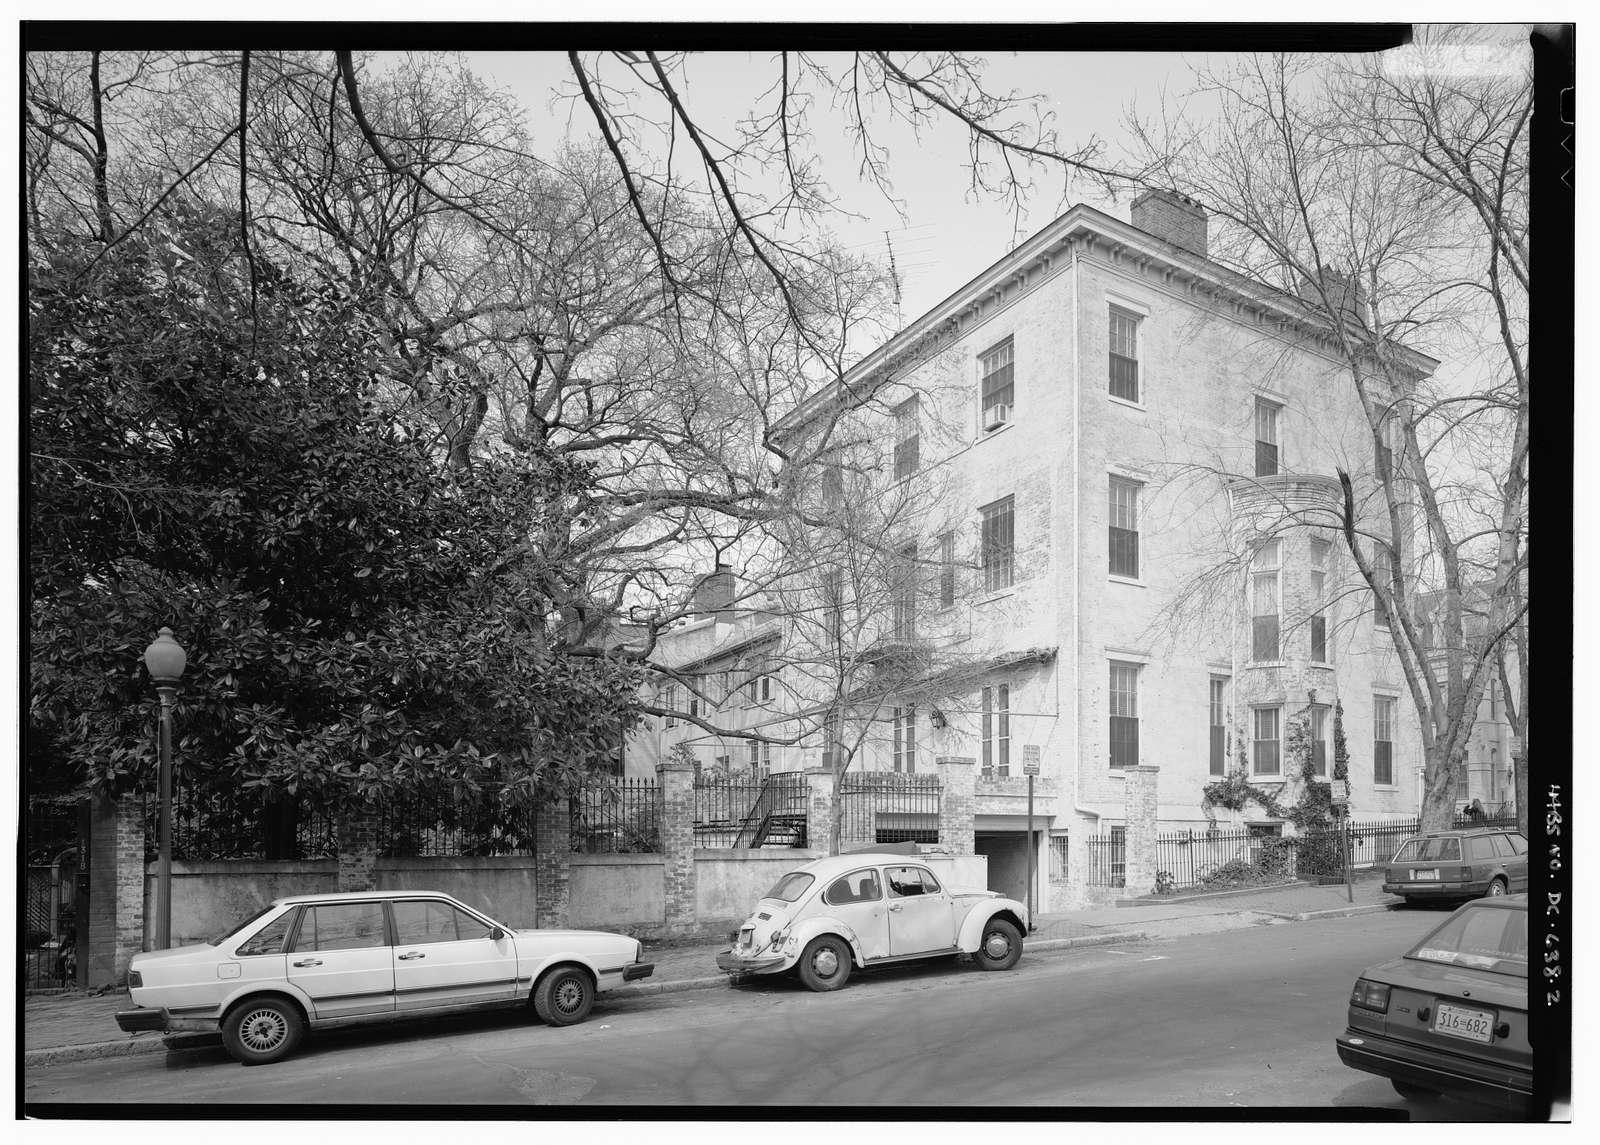 3300 O Street, Northwest (House), Washington, District of Columbia, DC